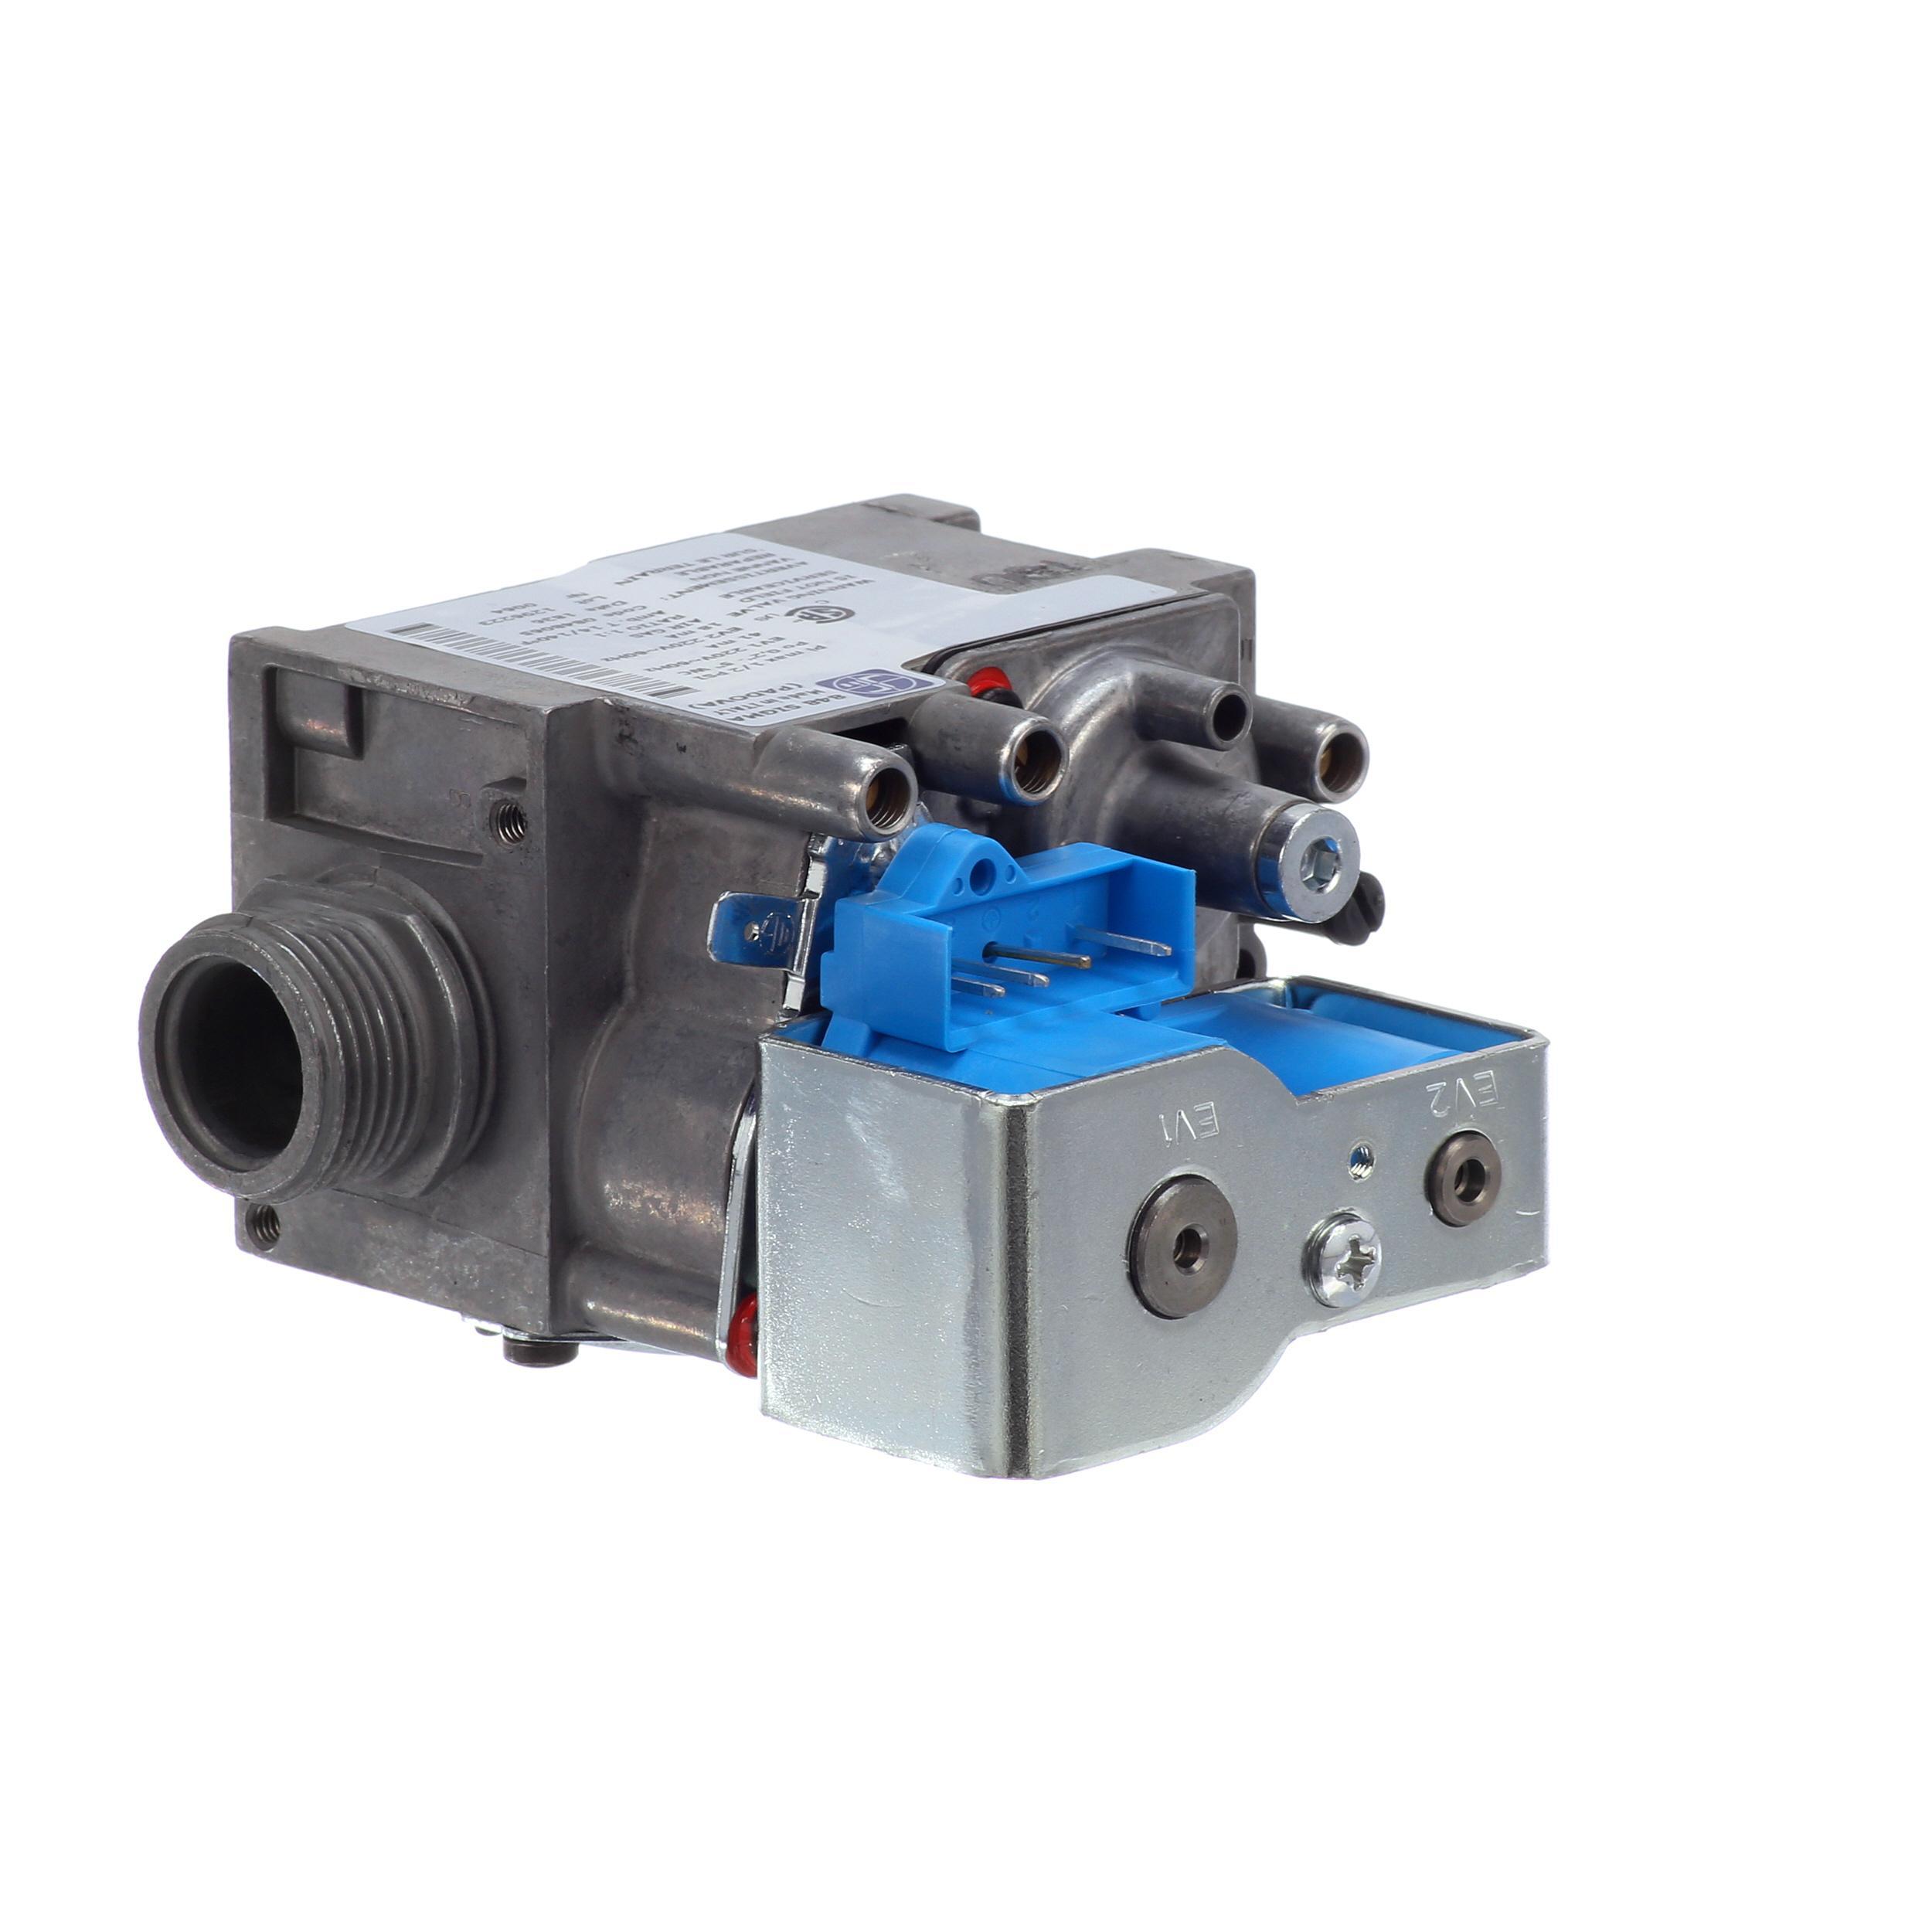 ELECTROLUX GAS VALVE; 220V 60HZ; USA